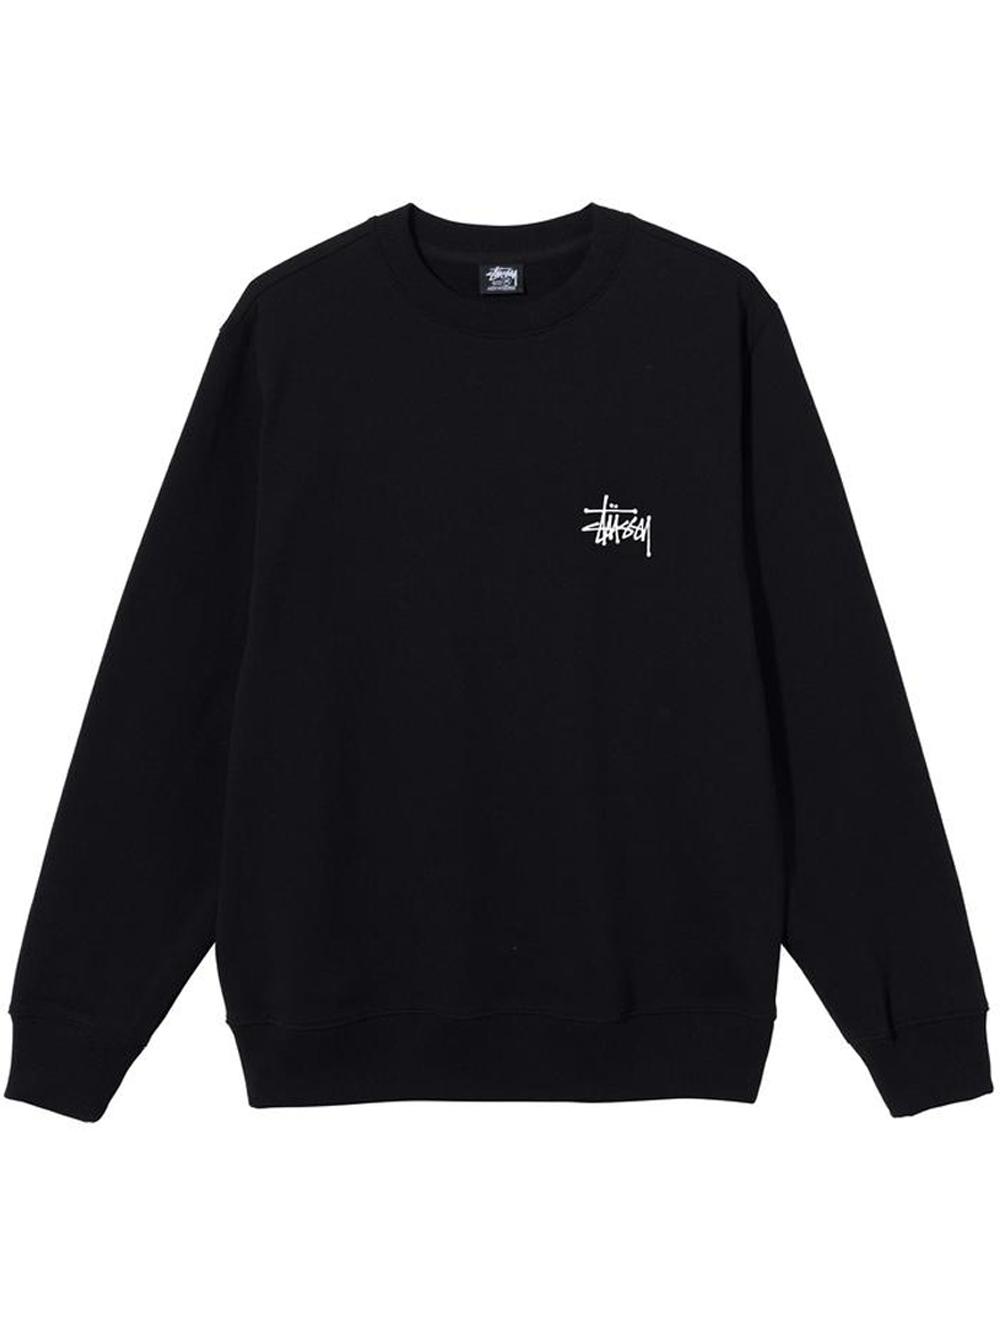 basic stussy crew man black in cotton STUSSY | Sweatshirts | 1914649SBLACK